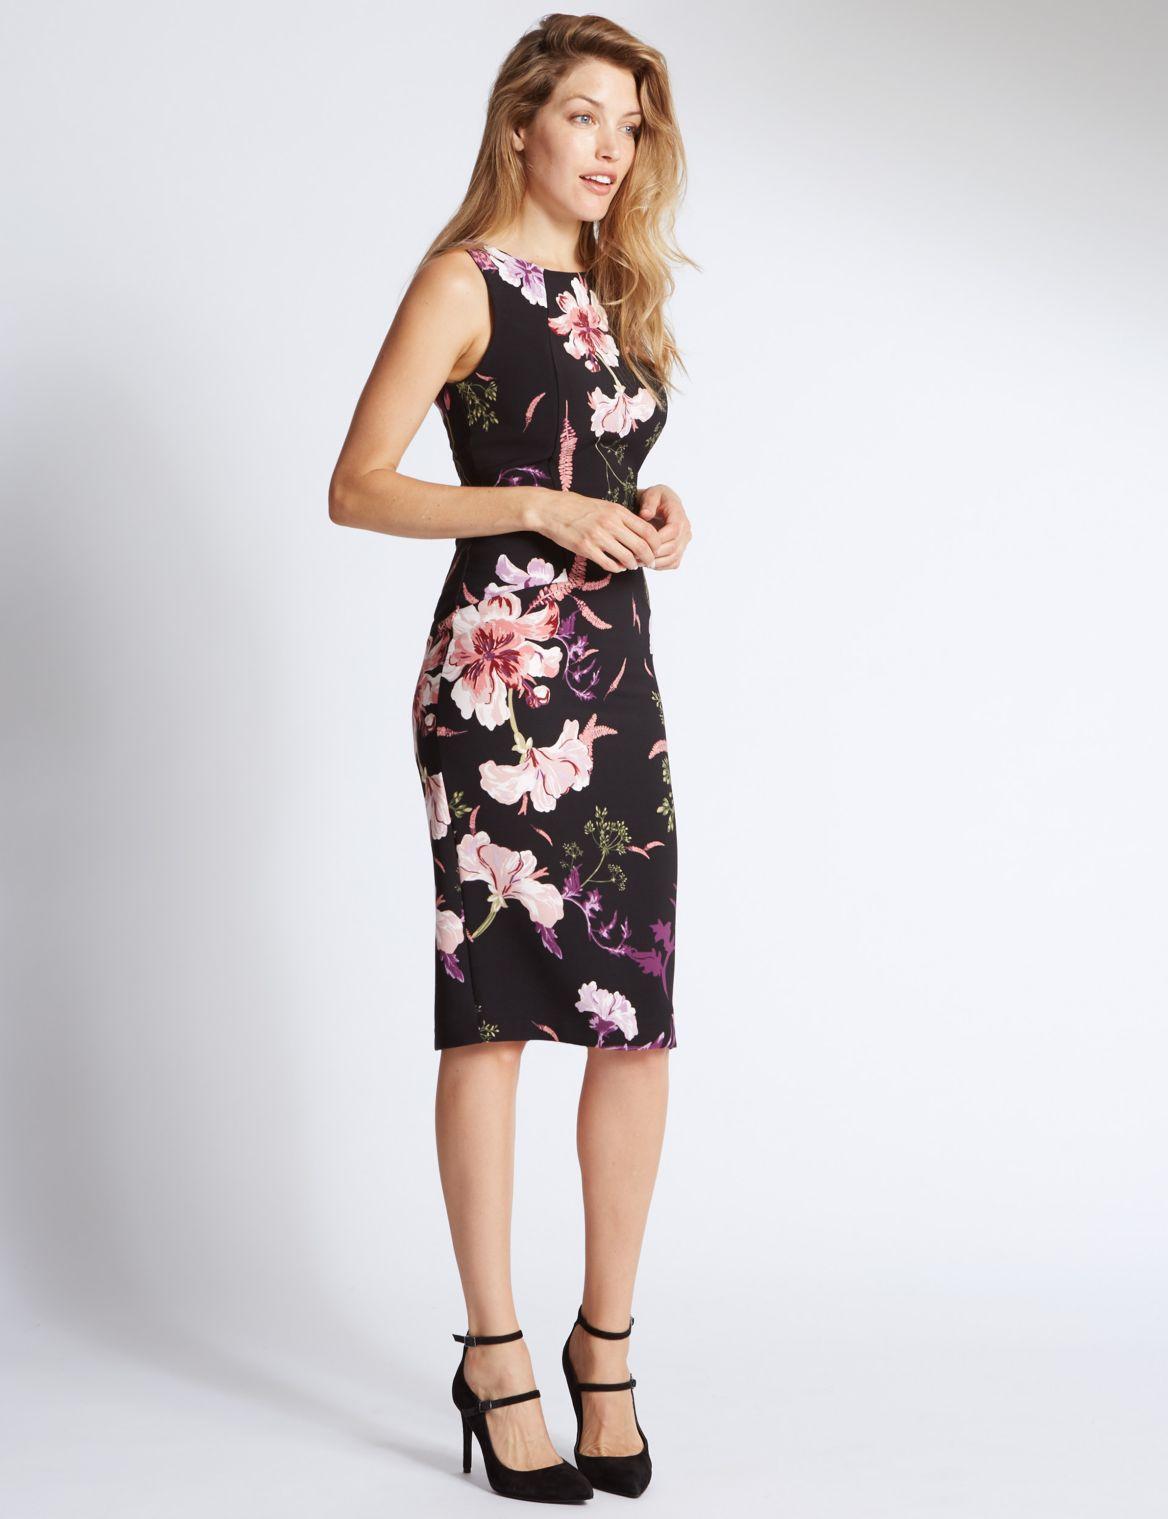 Floral Print Sleeveless Bodycon Dress multi